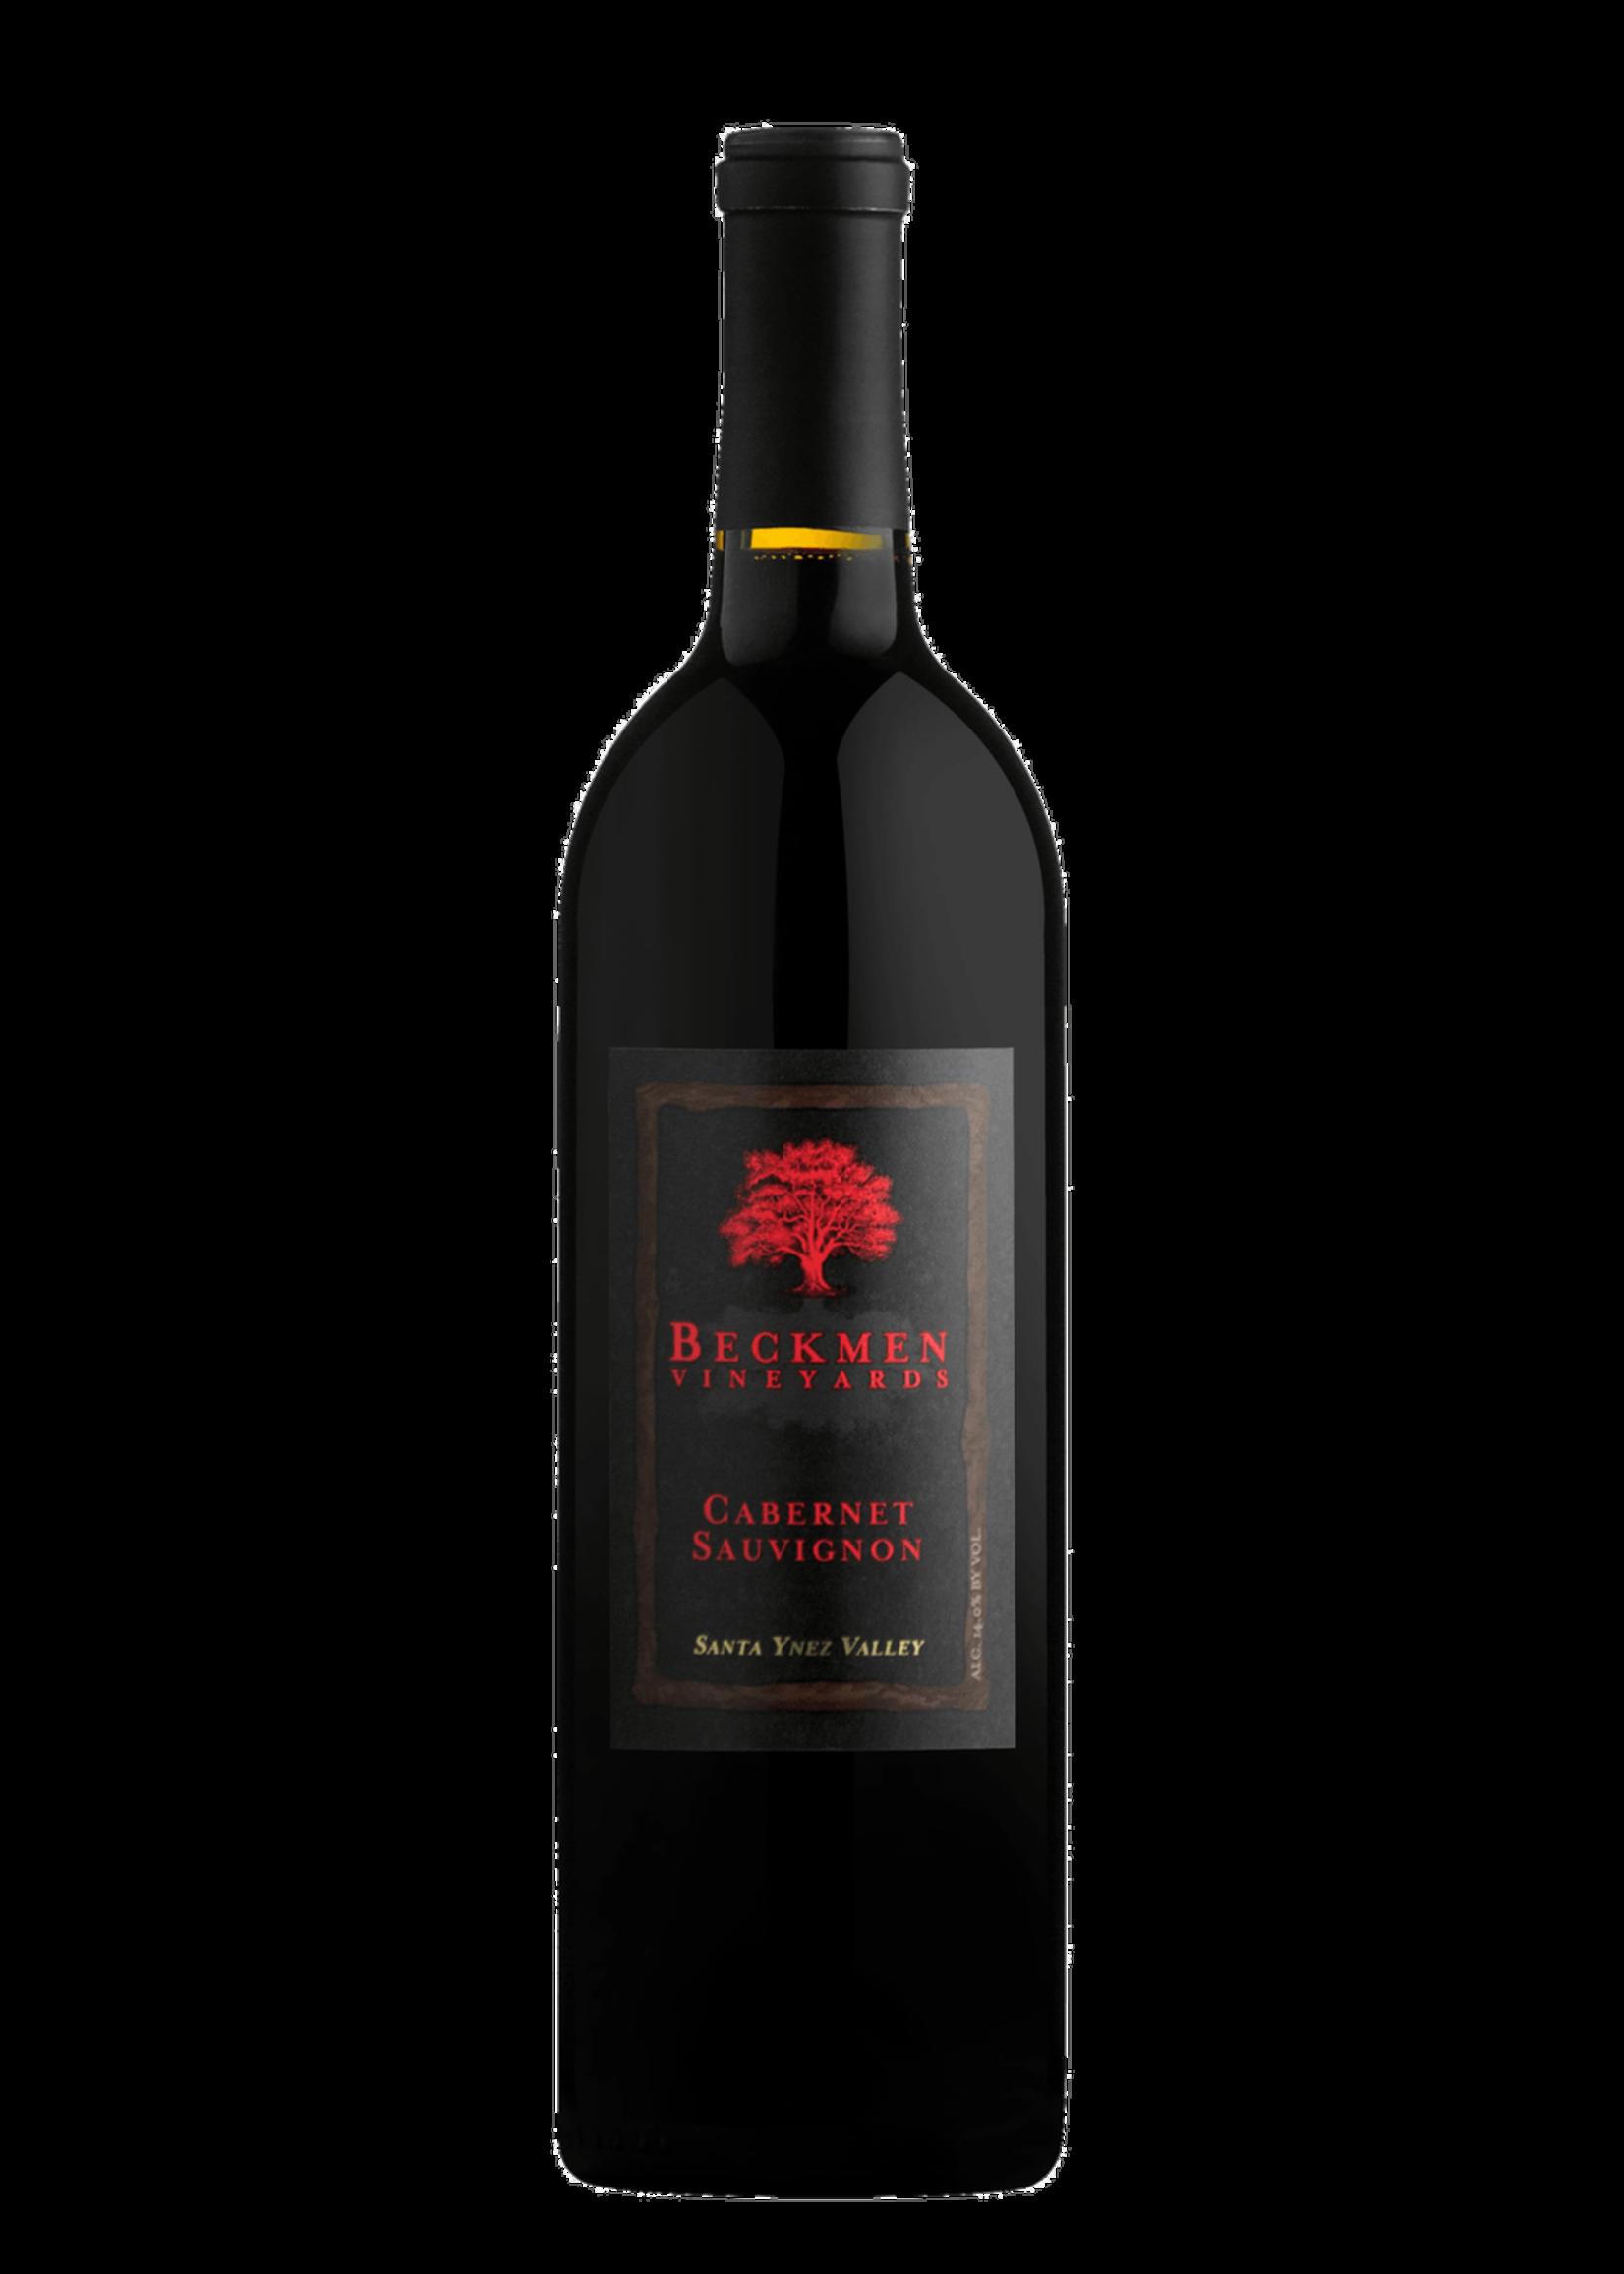 Beckmen Vineyards Beckmen Vineyards / Santa Ynez Valley / Cabernet Sauvignon / 750mL